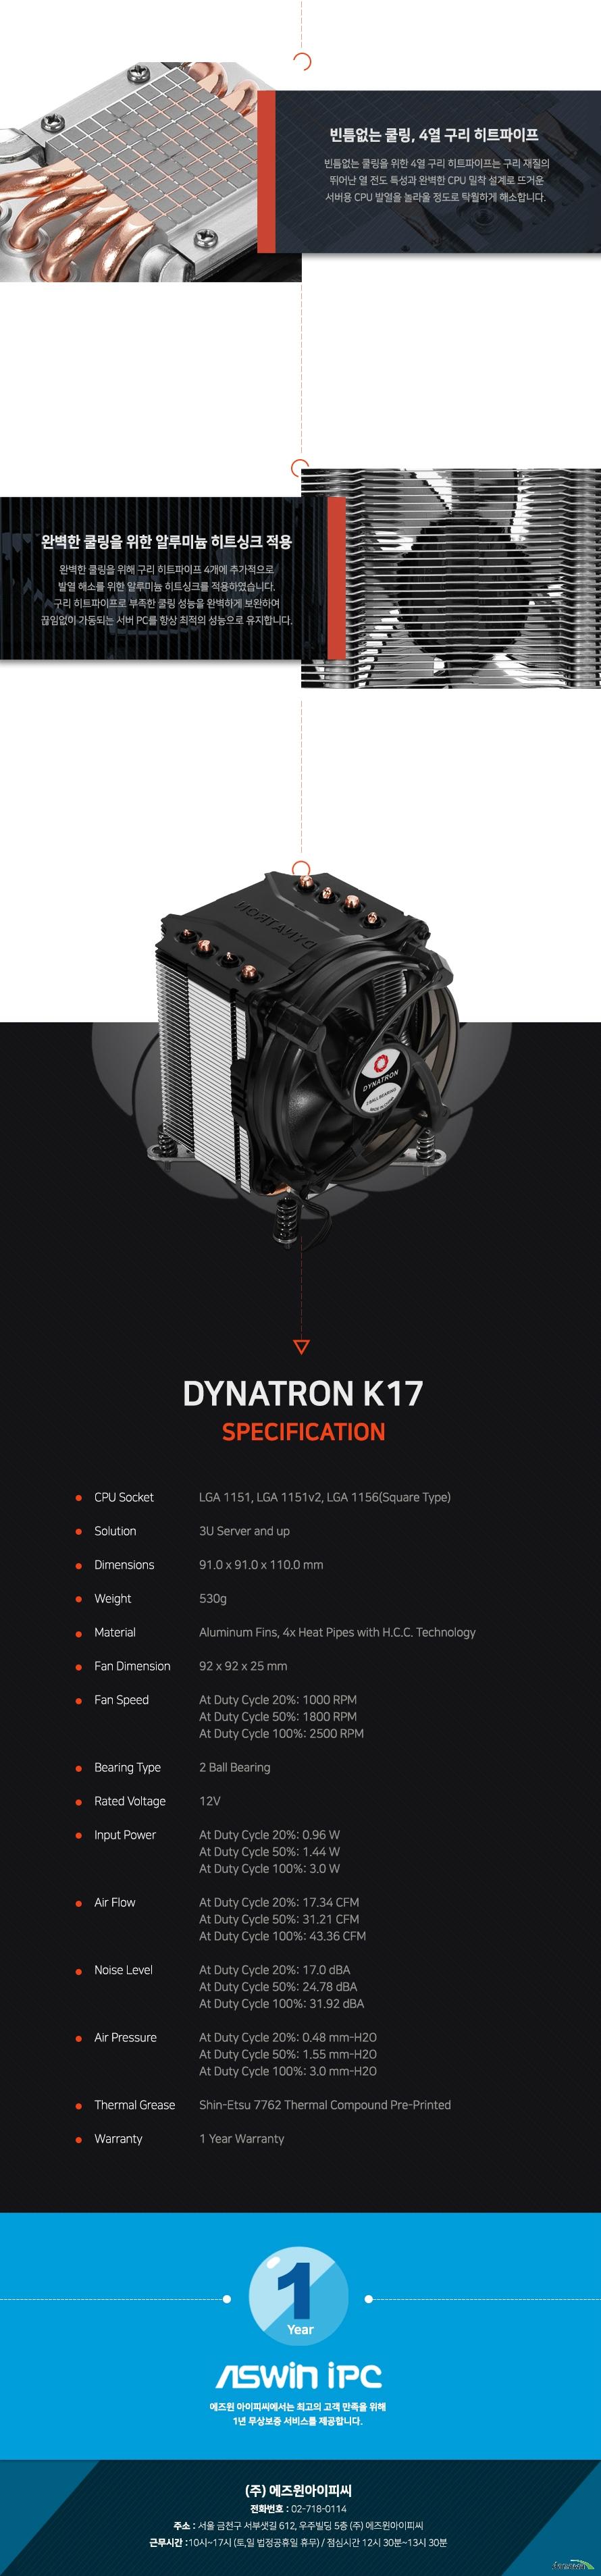 DYNATRON K17